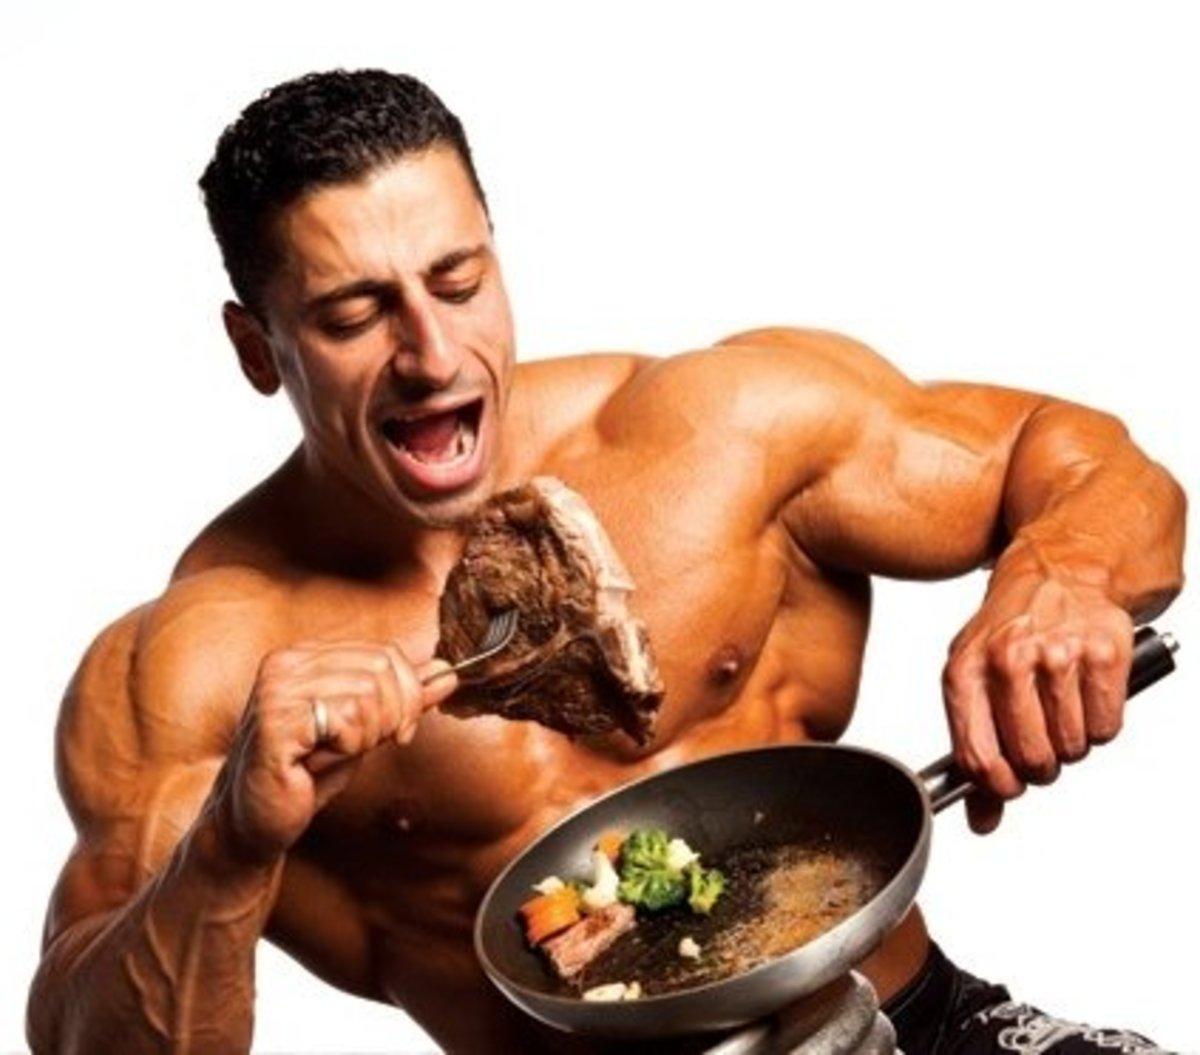 im-forever-dreaming-of-bigger-better-muscles